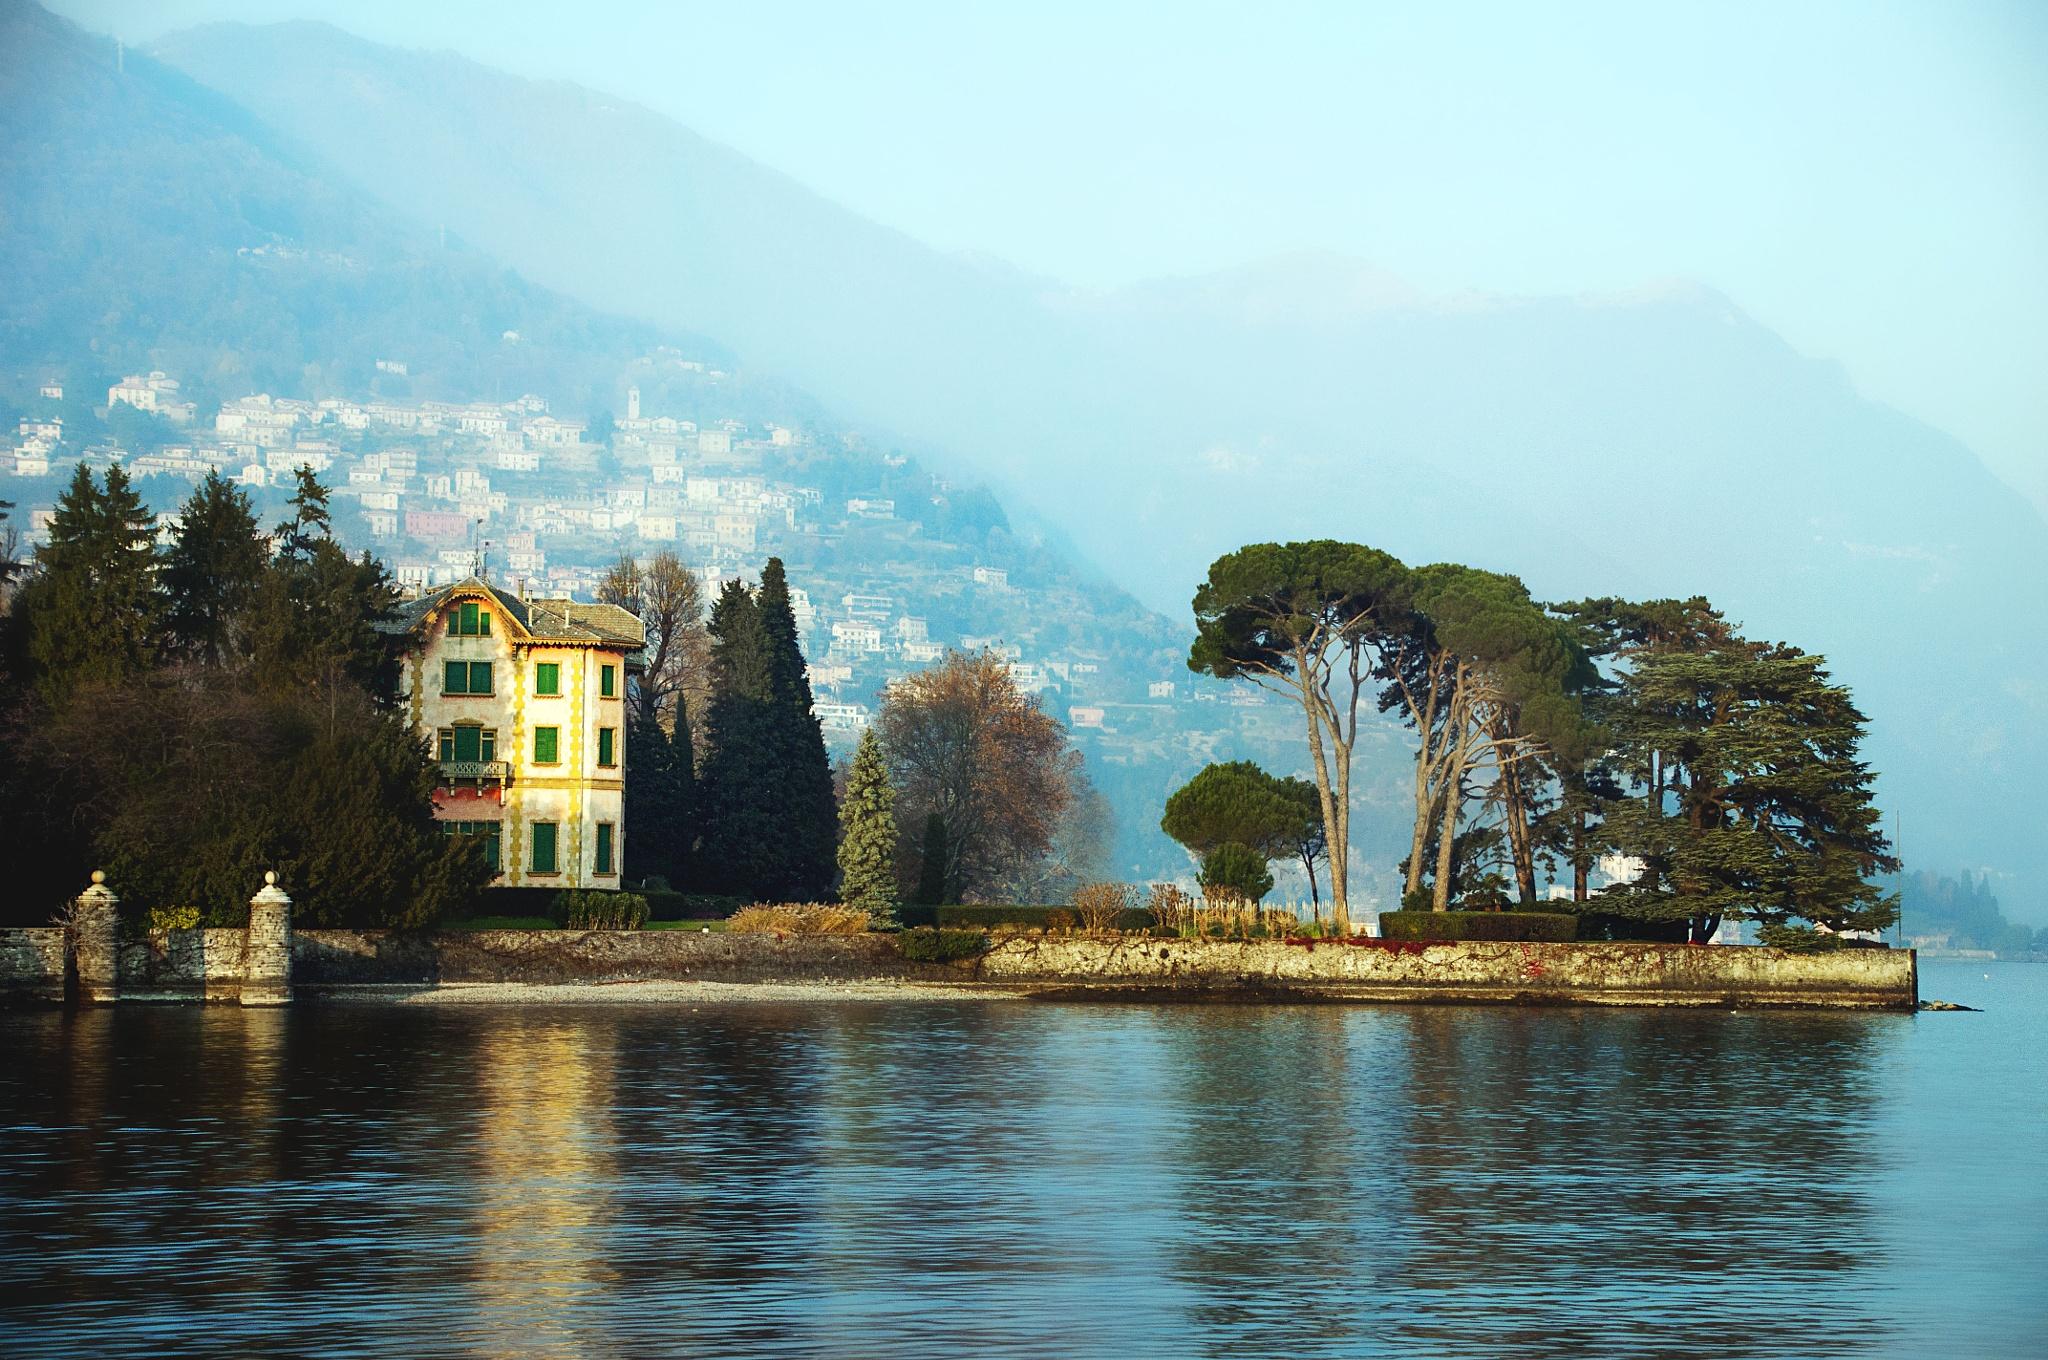 Lake Como by Jacqueline Rose